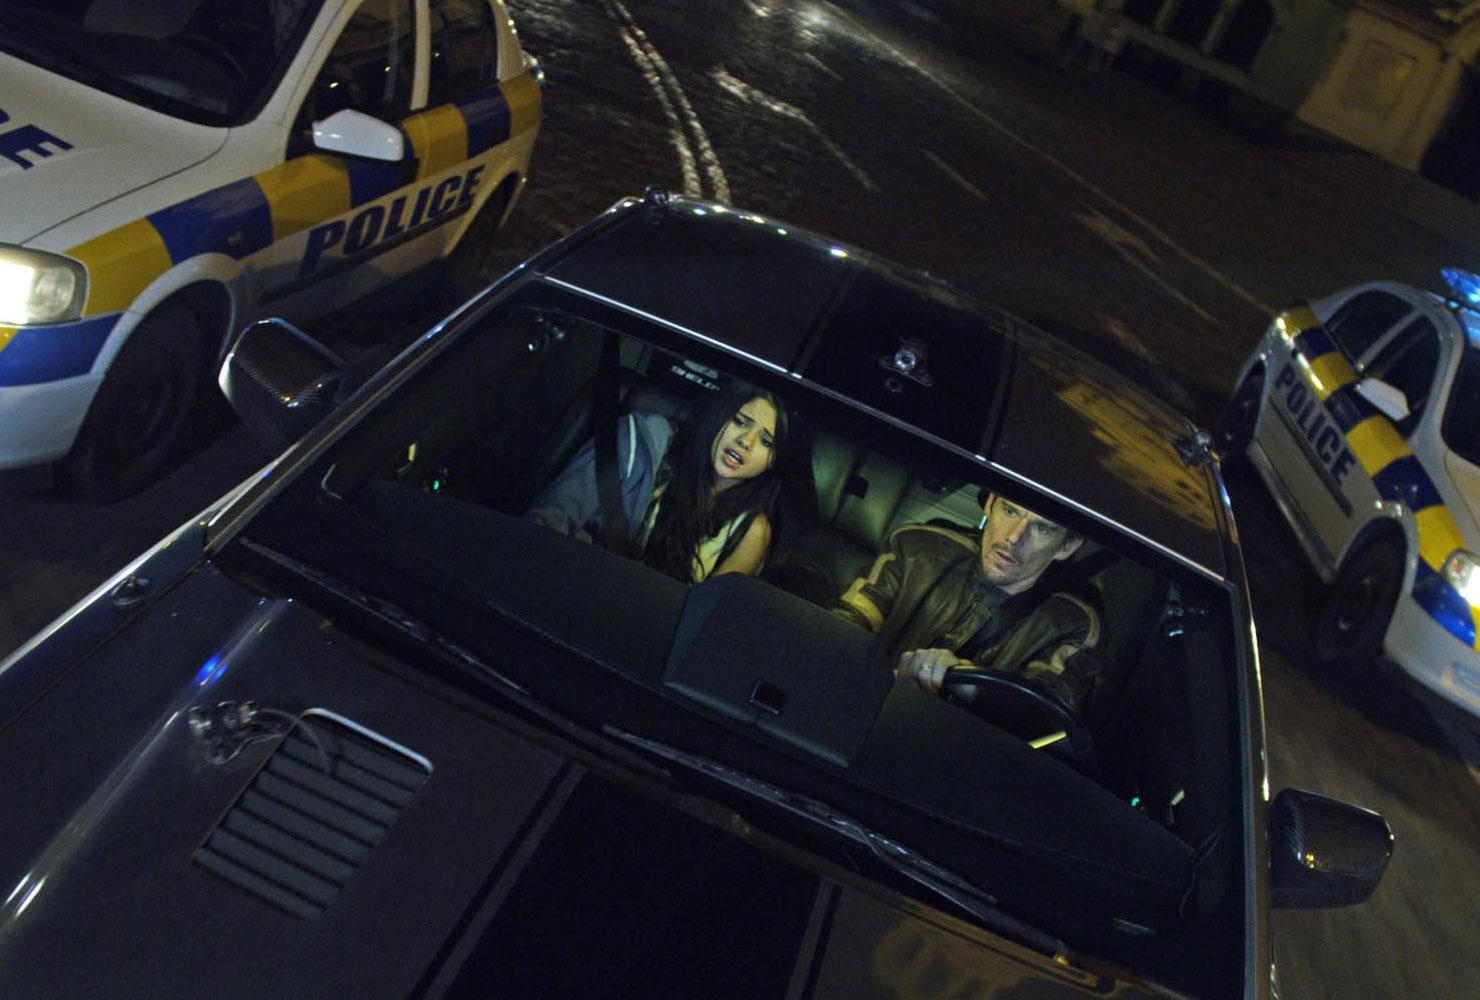 Selena Gomez and Ethan Hawke star in Getaway. (Photo: Warner Bros.)